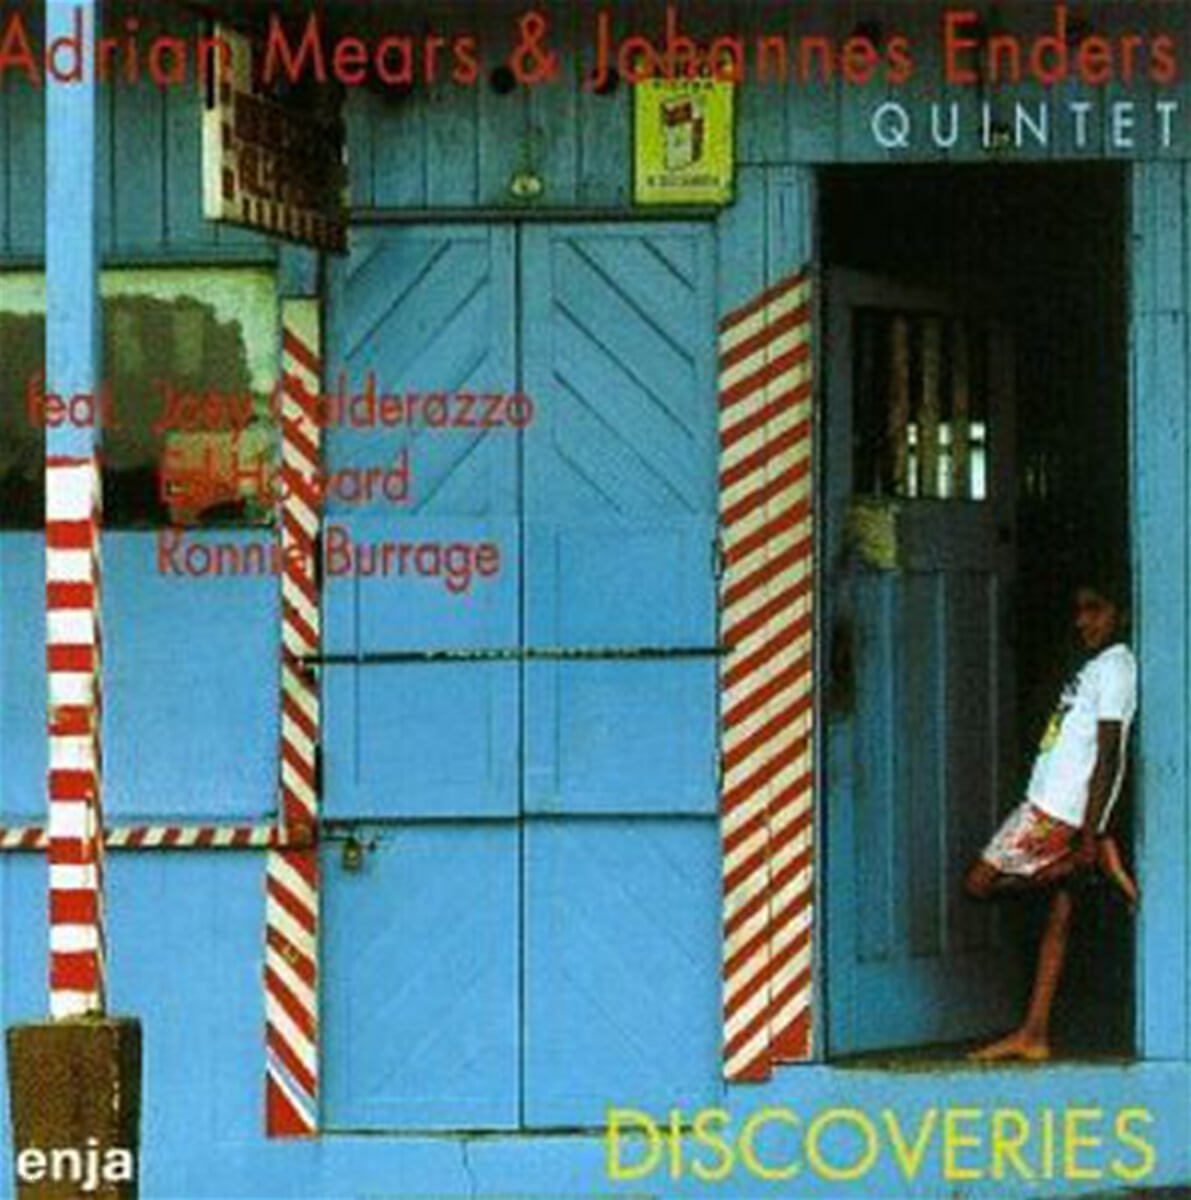 Adrian Mears / Johannes Enders Quintet (아드리안 메어스 / 요하네스 엔더스 퀸텟) - Discoveries